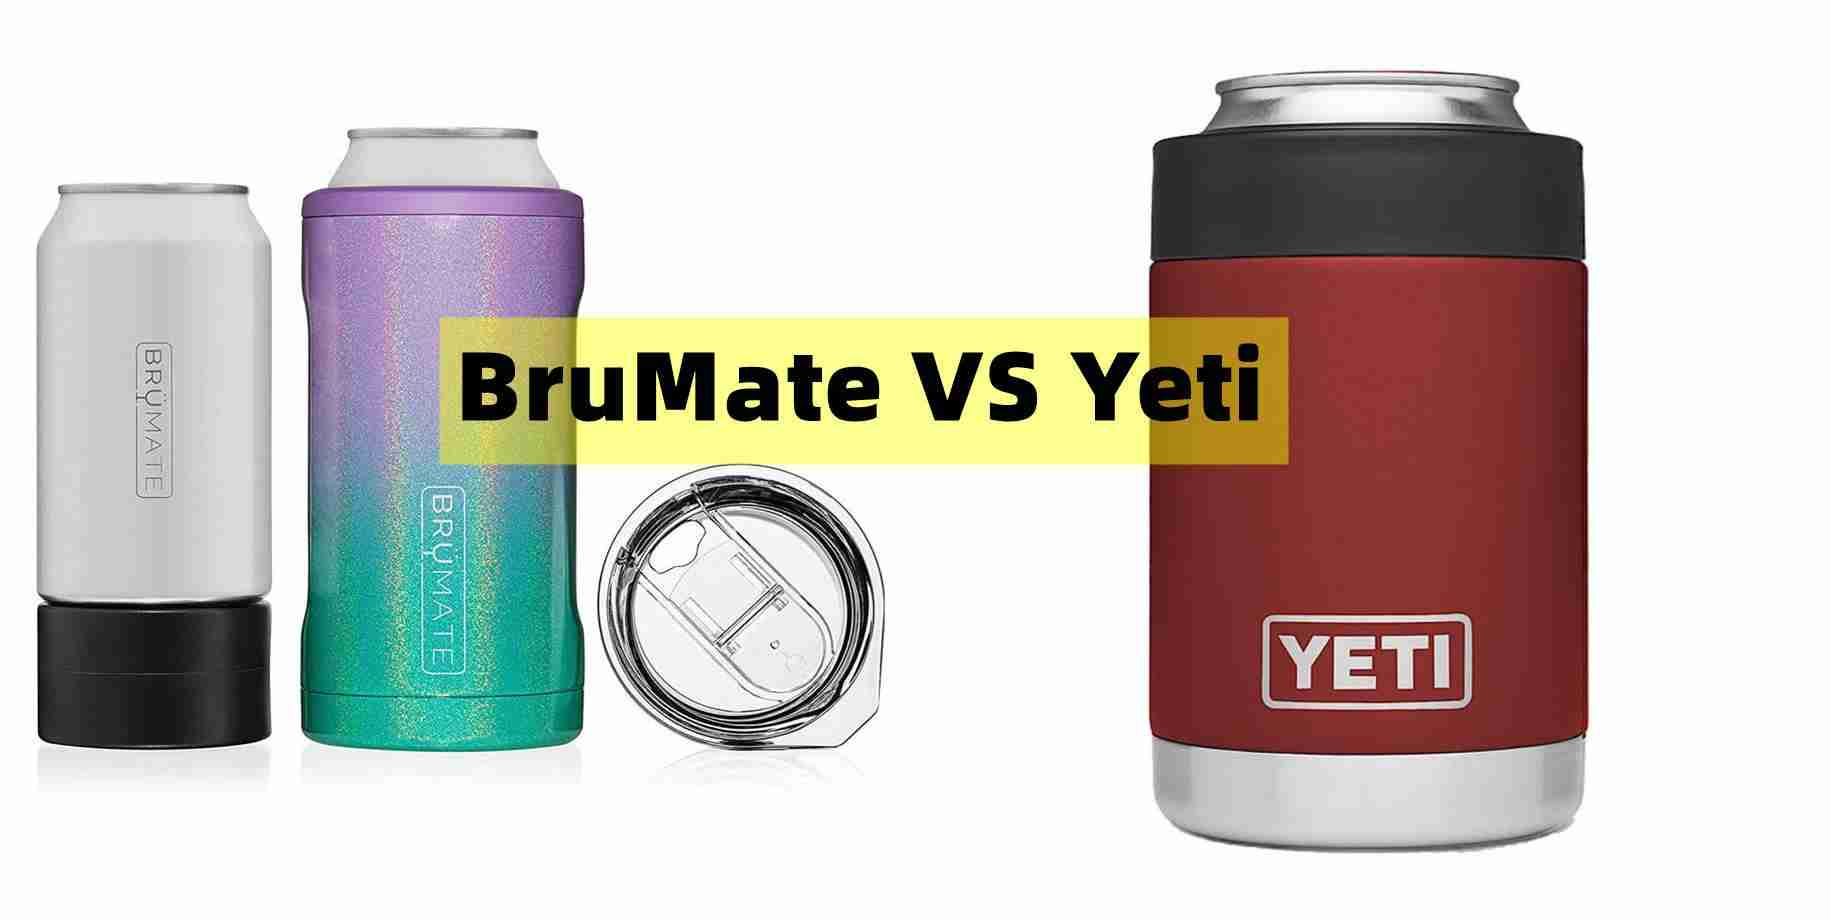 is brumate better than yeti